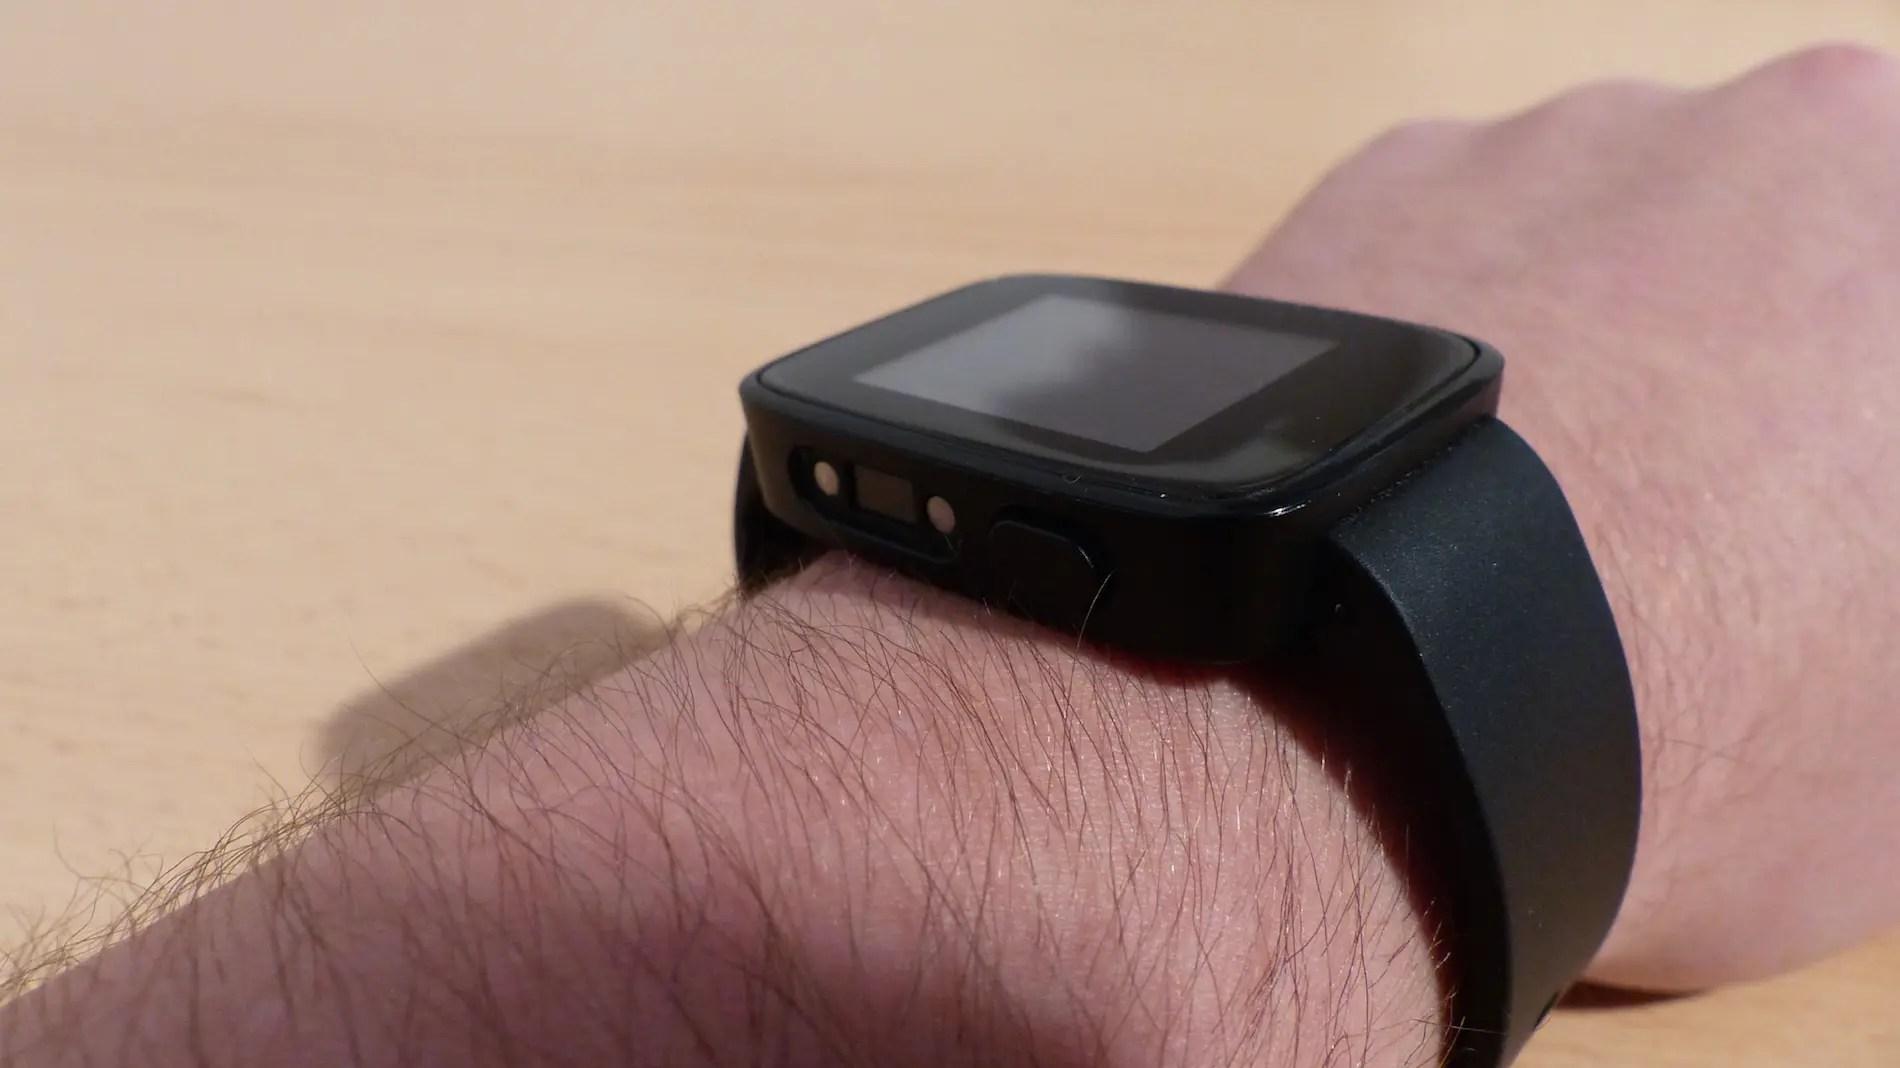 Weloop Tommy: The beta smart watch